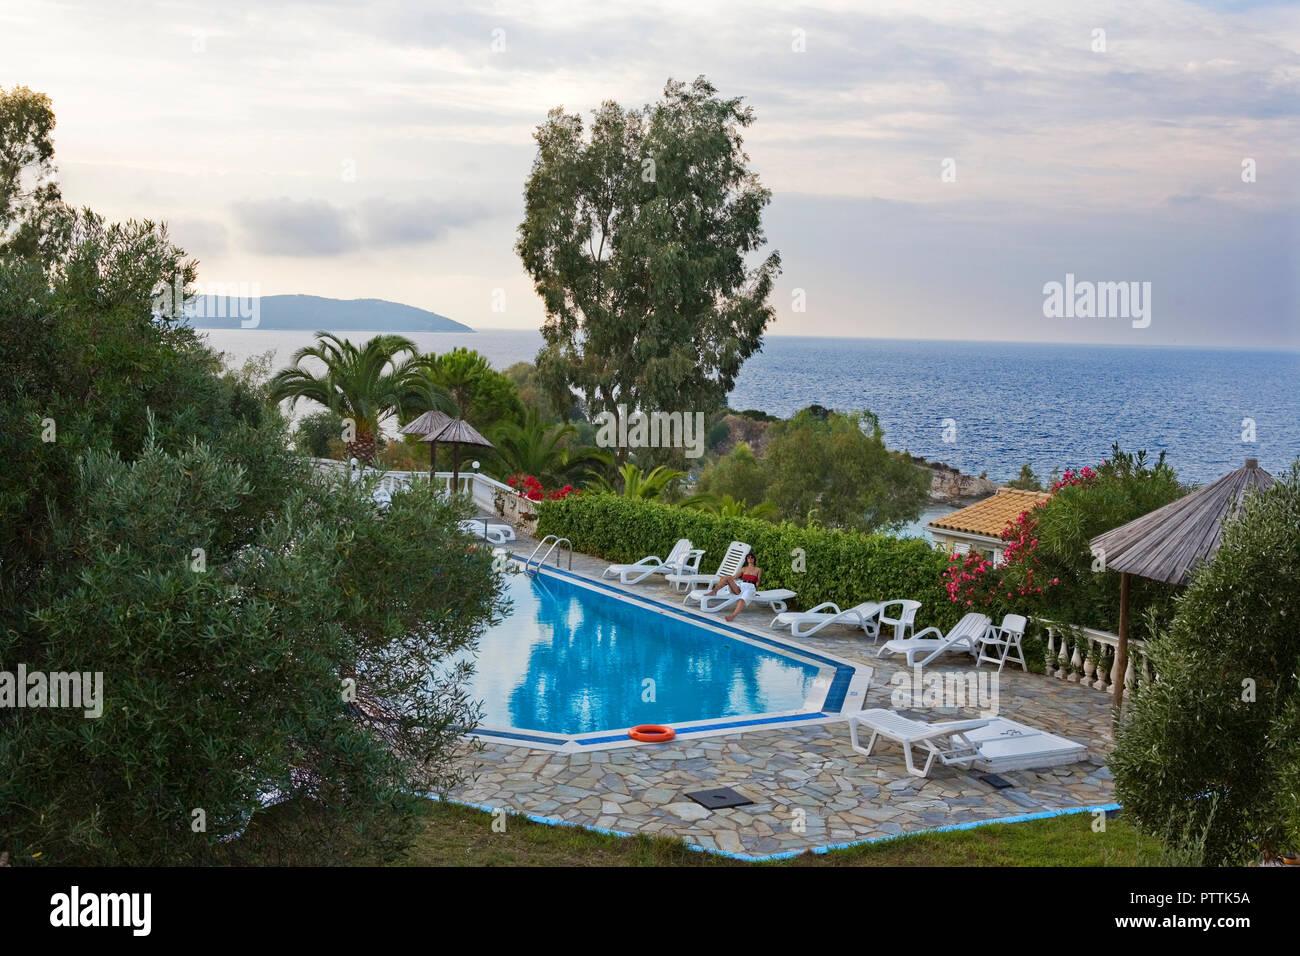 Villa pool at Bataria Beach, Kassiopi, Corfu, Greece - Stock Image